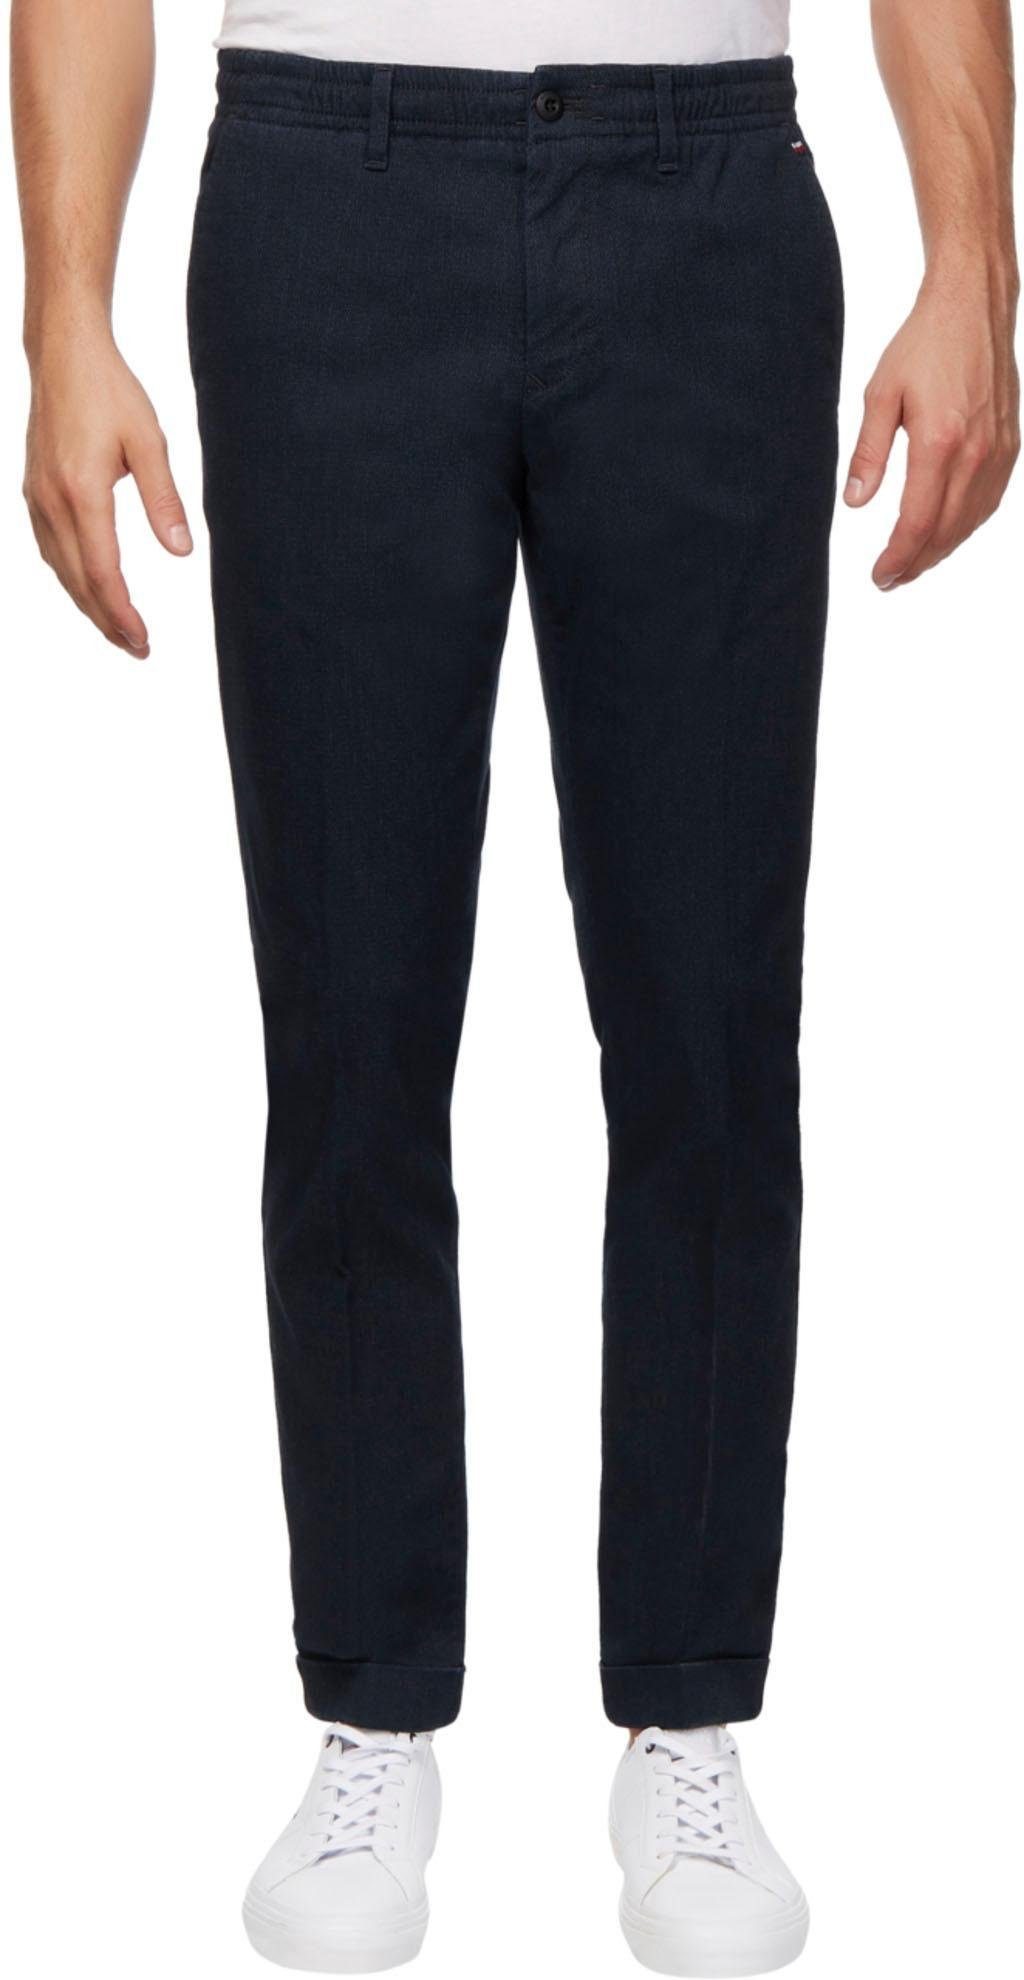 TOMMY HILFIGER 5 Pocket Hose »ACTIVE TH FLEX STRETCH MELANGE« online kaufen   OTTO